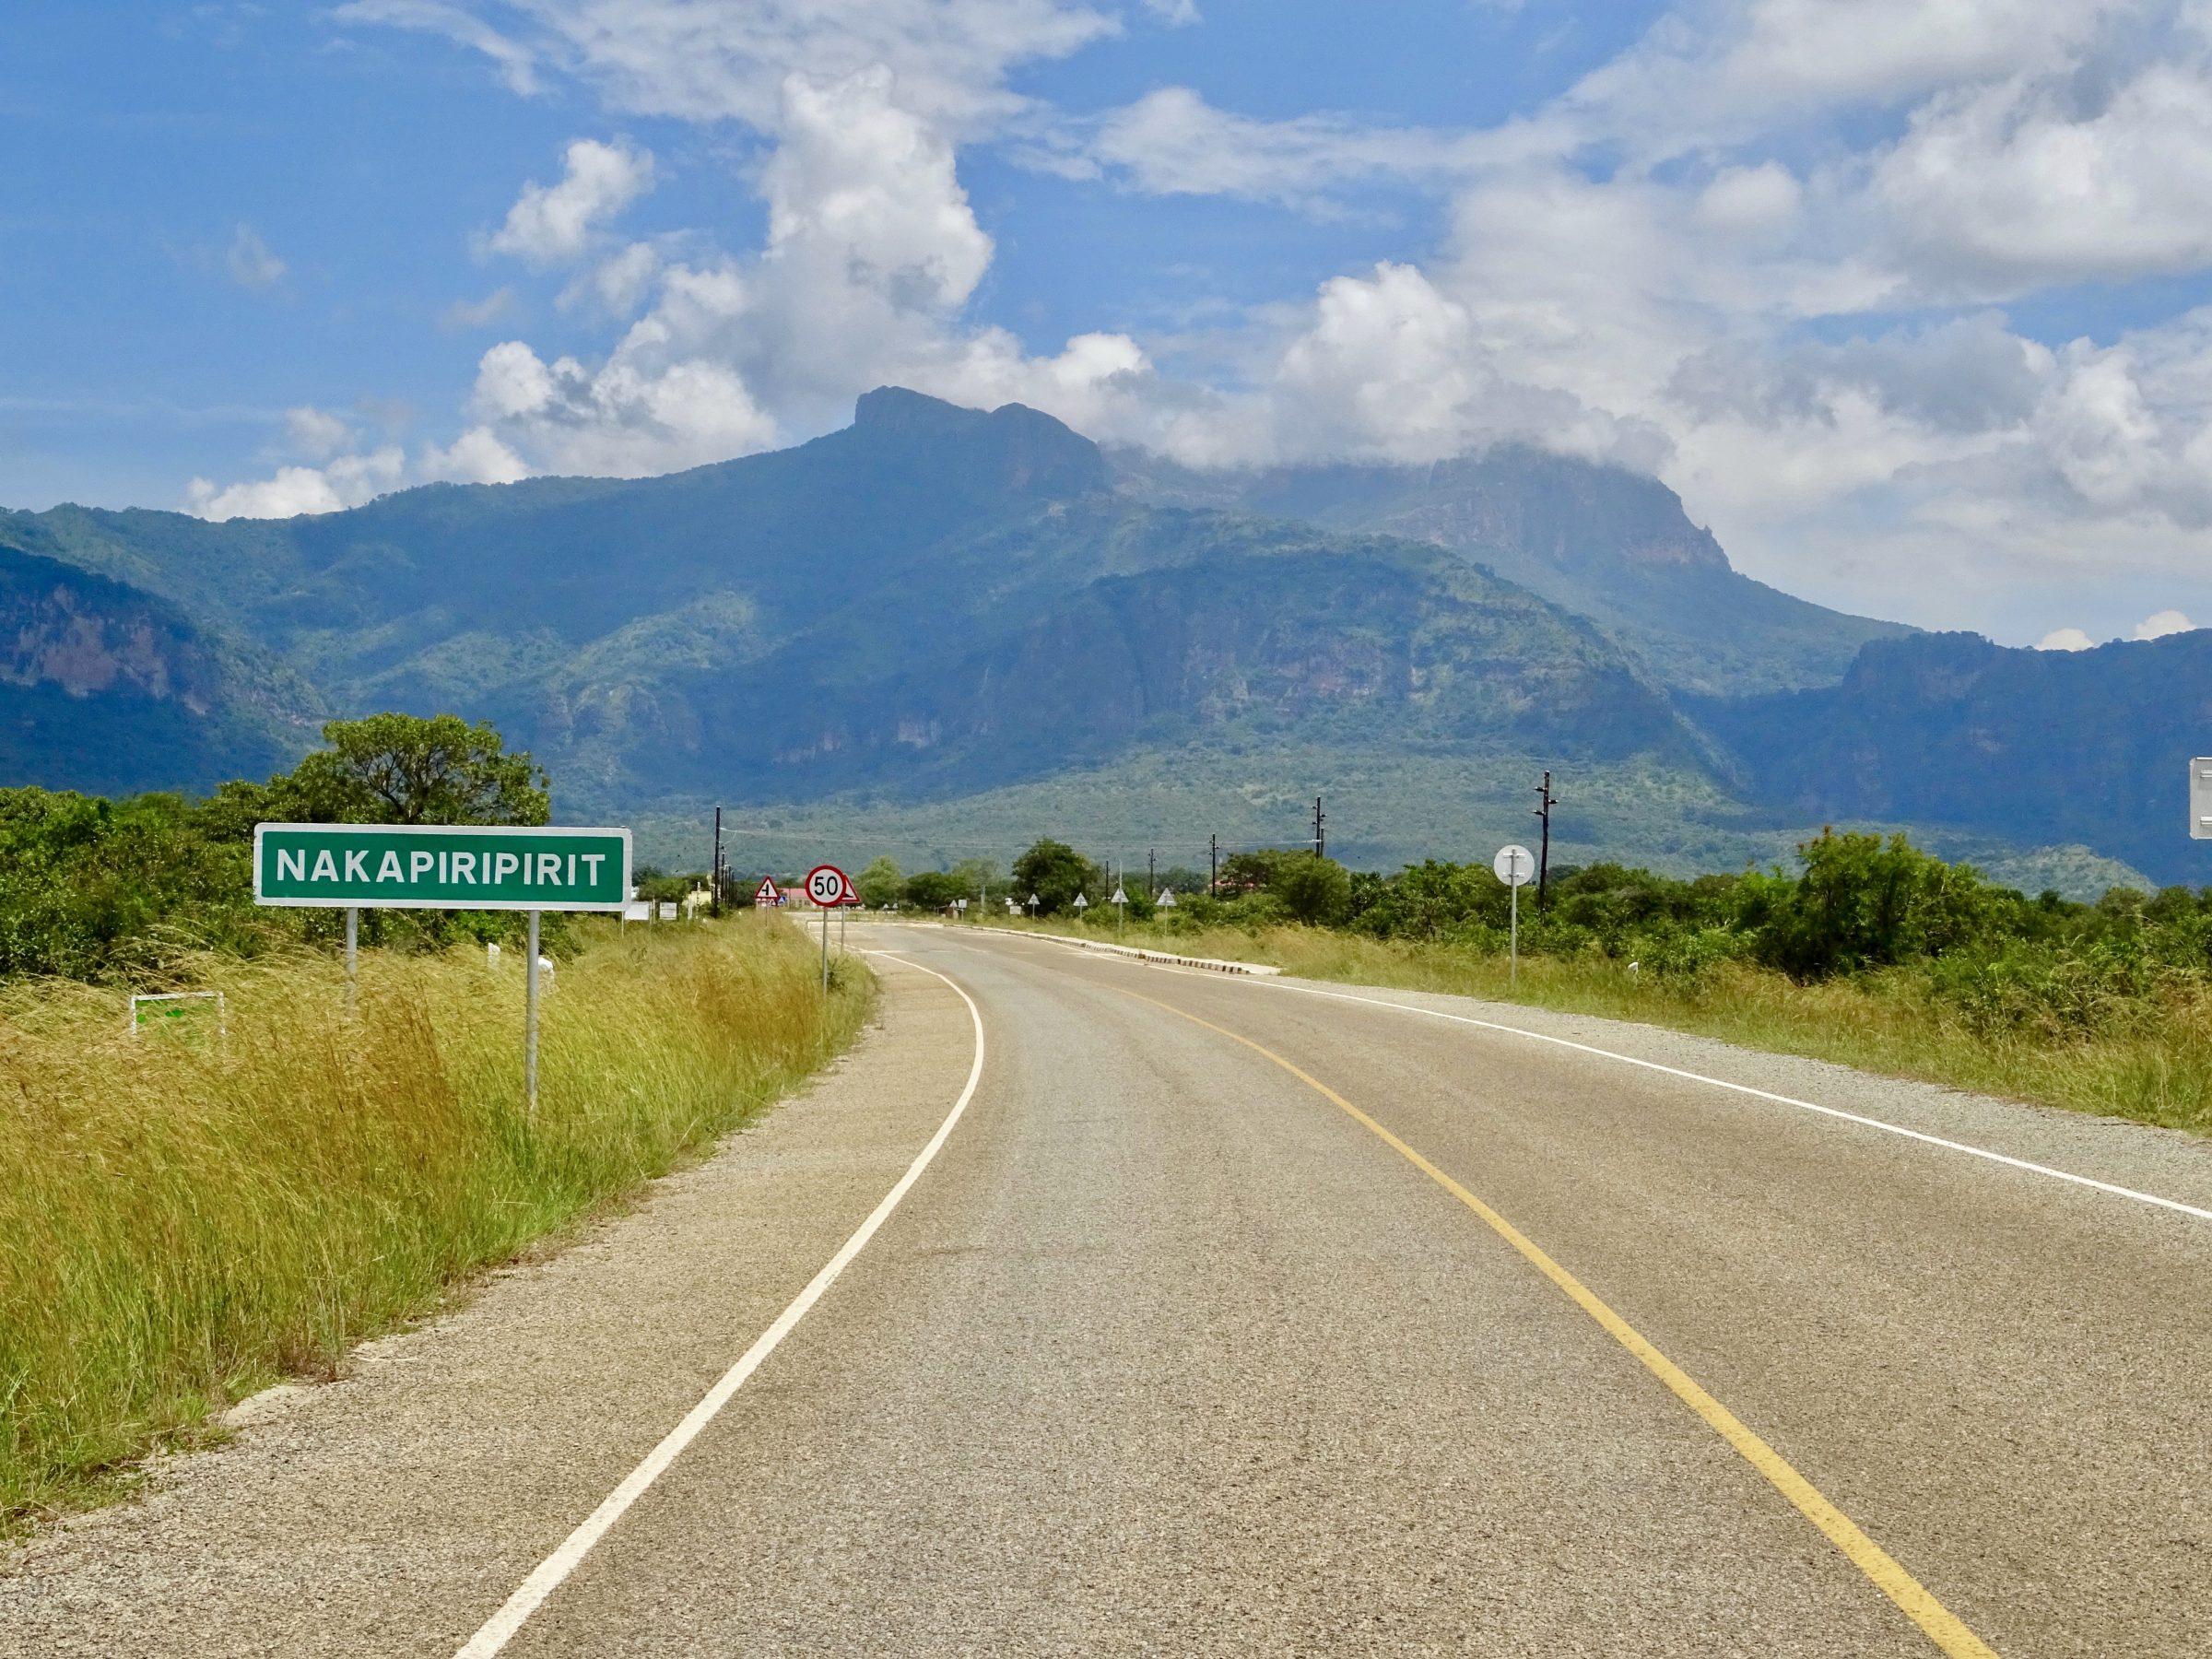 De asfaltweg van Moroto naar Nakapiripirit